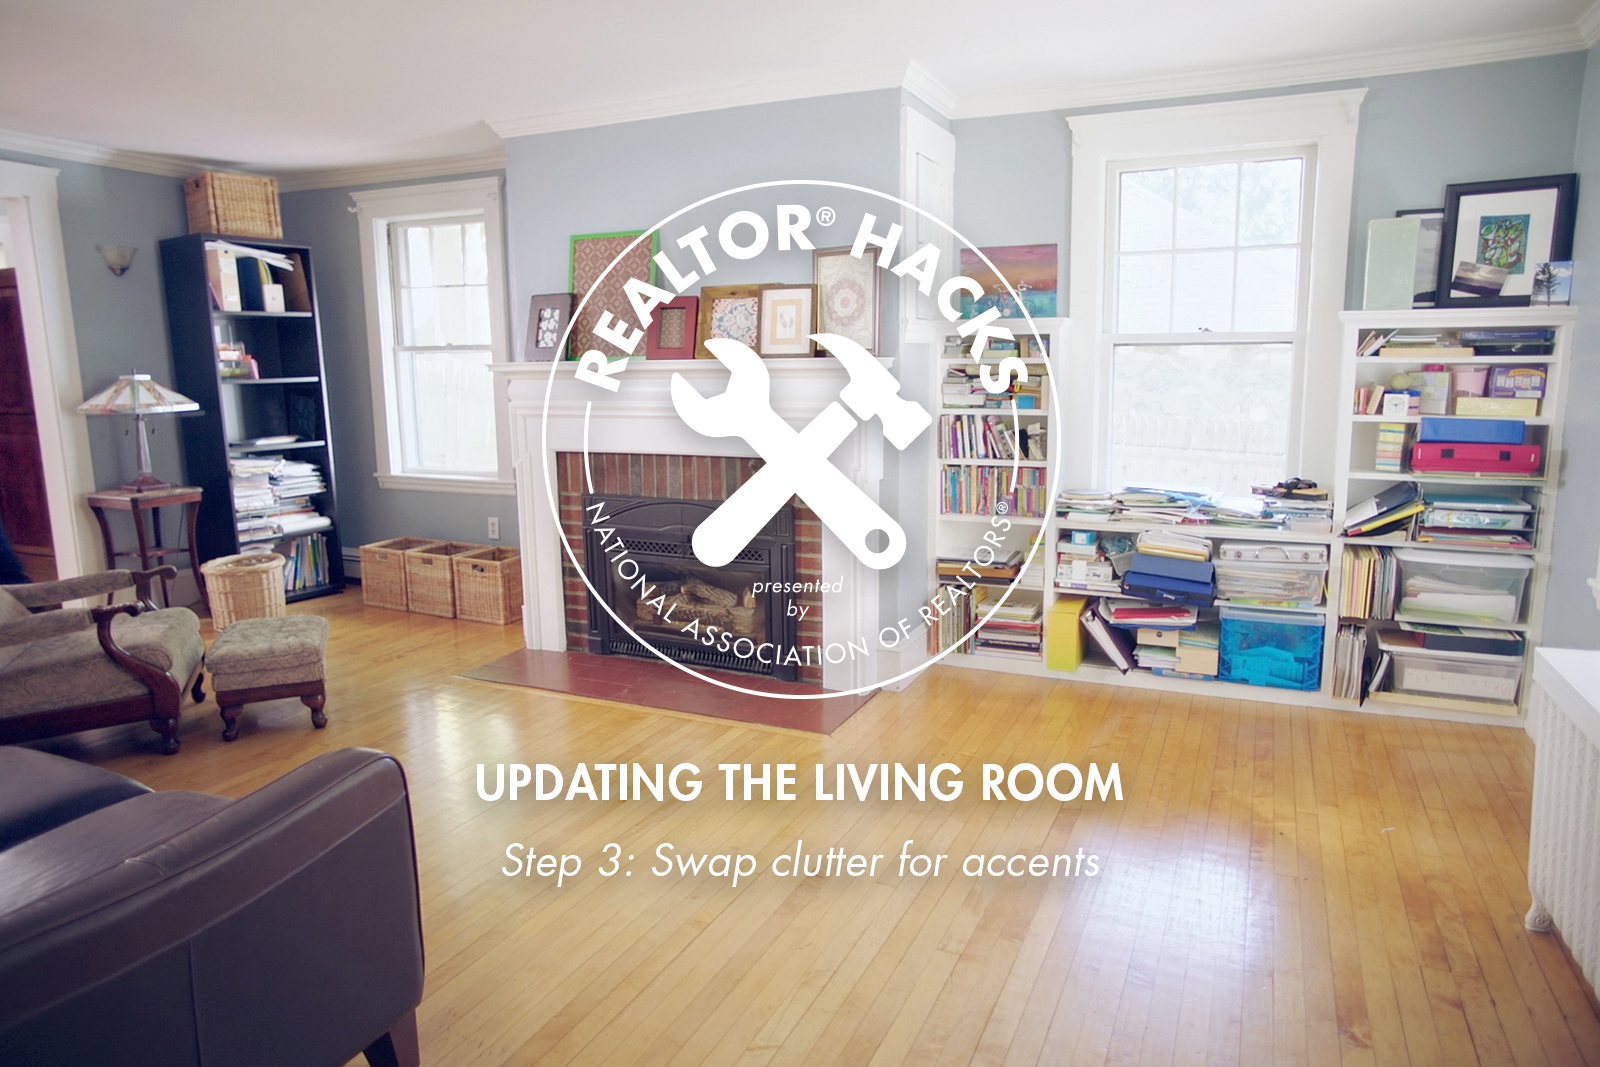 Realtor® Hacks: Updating the Living Room, Step 3